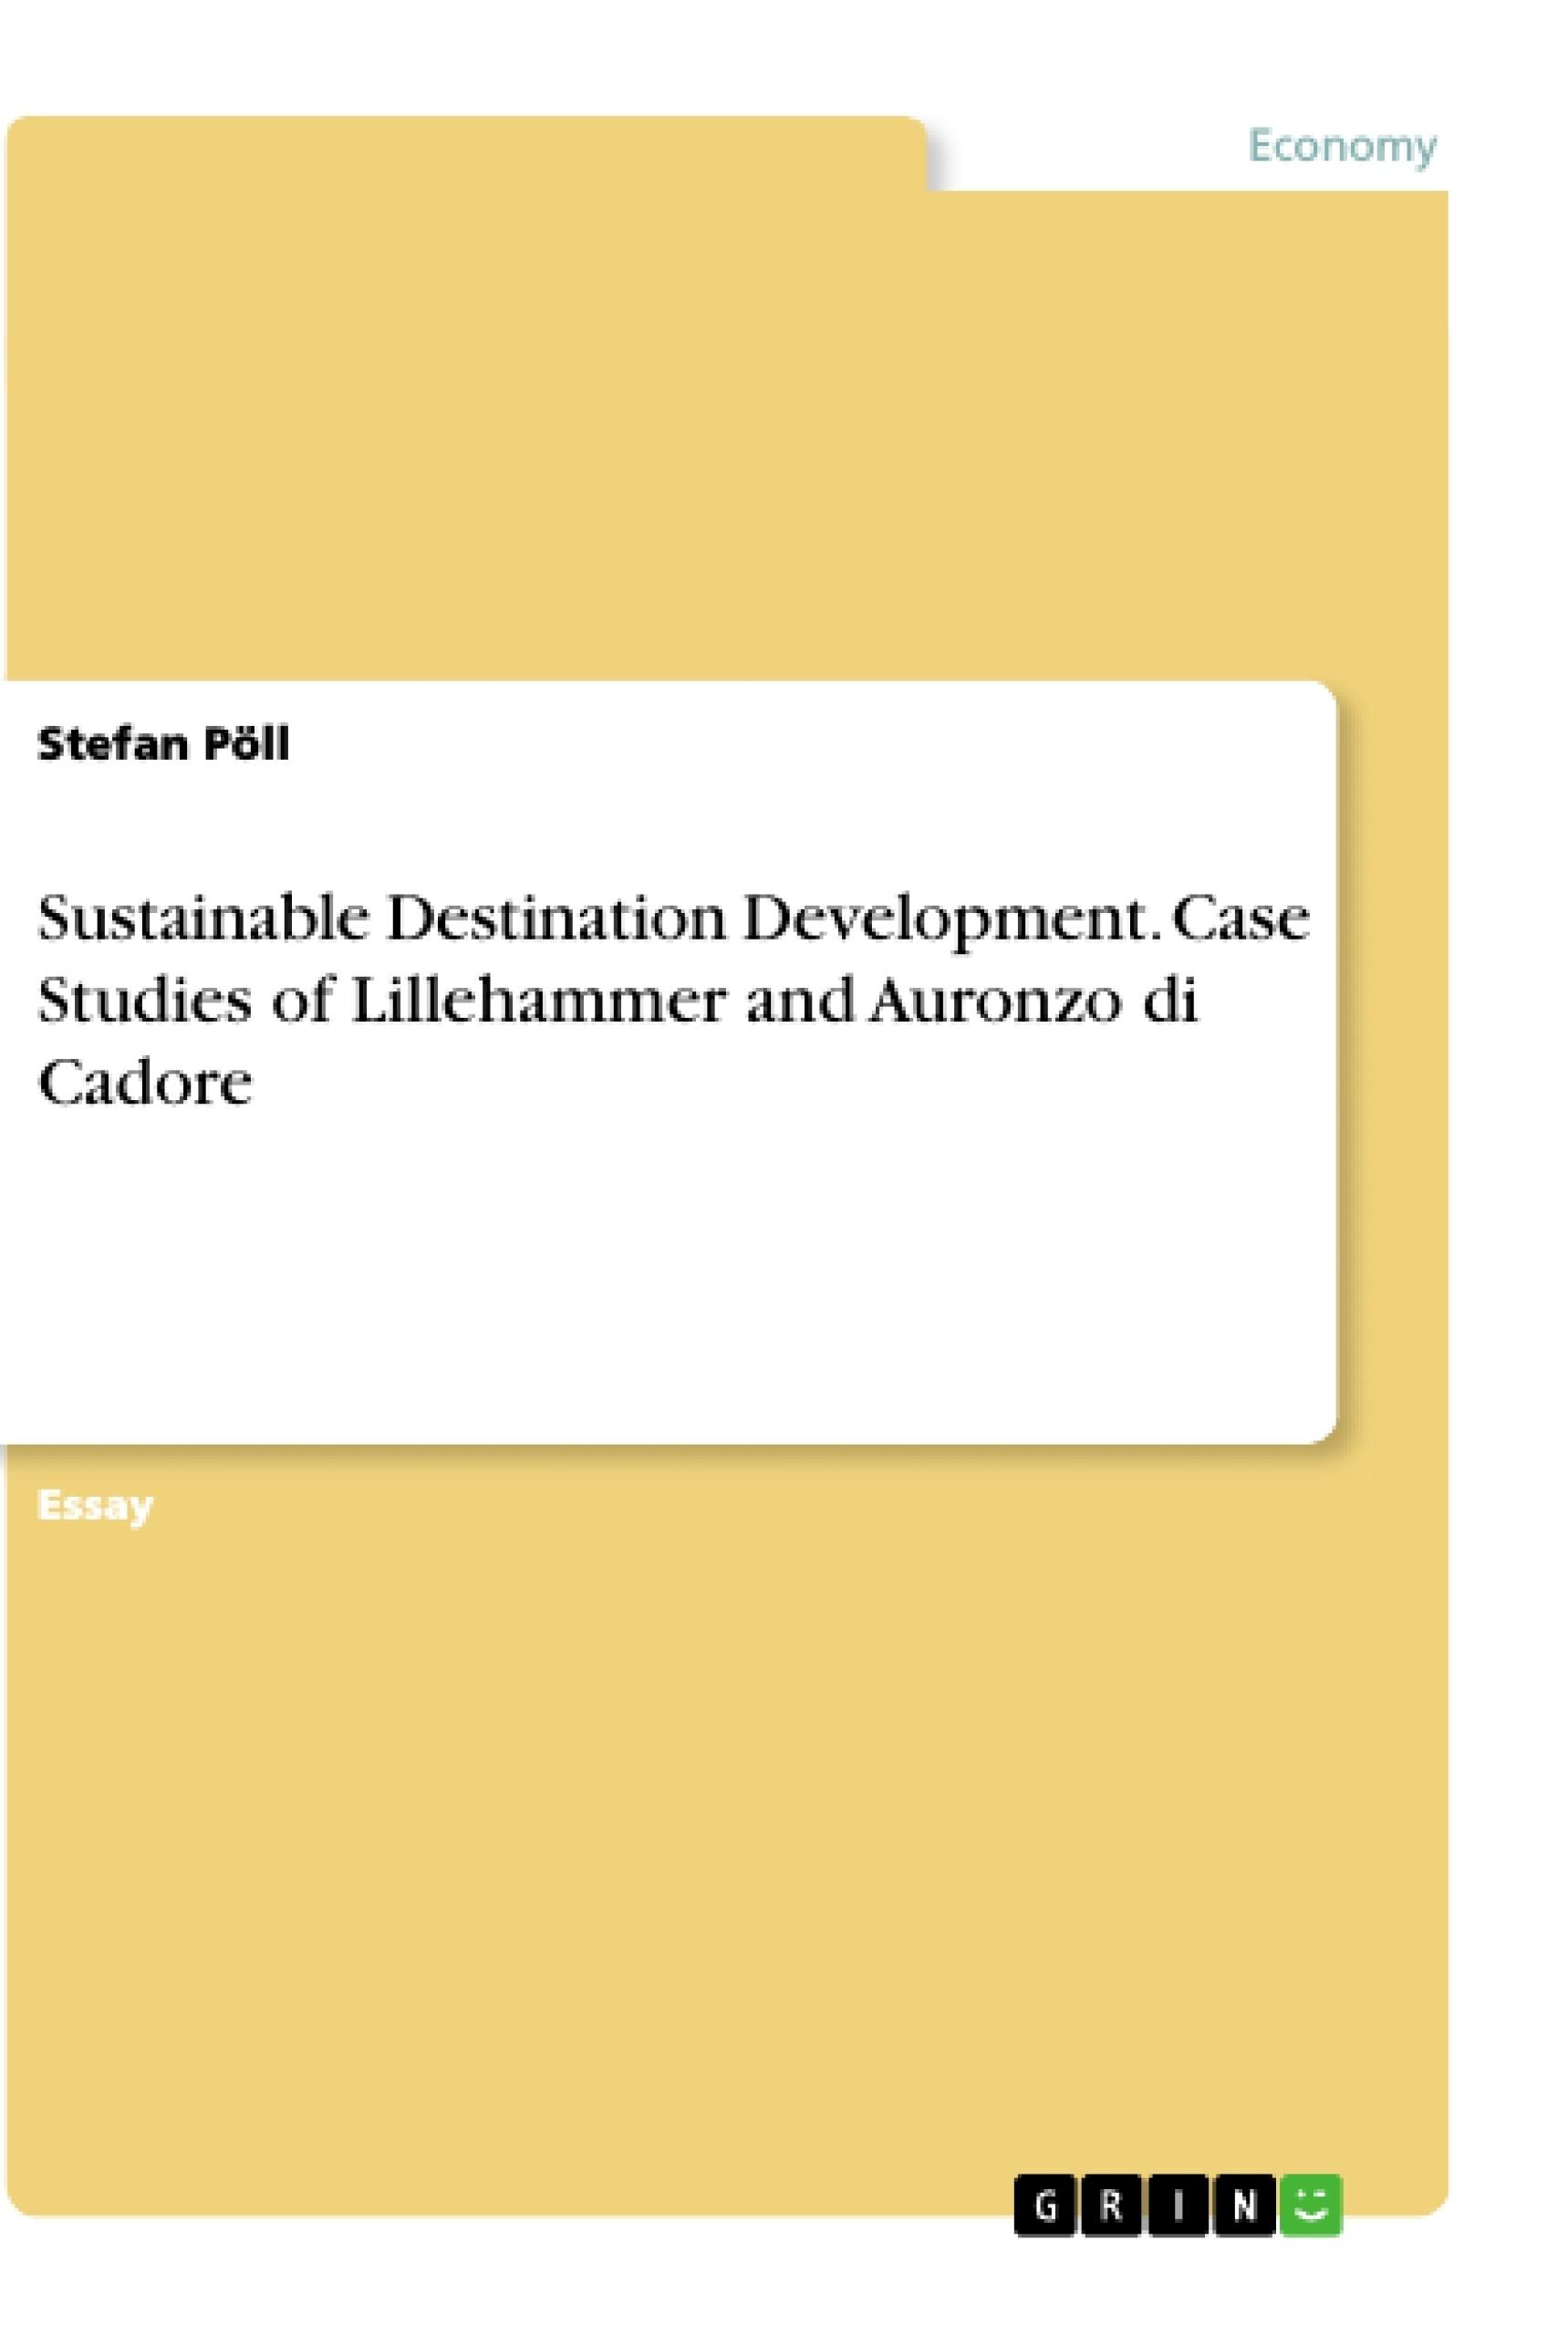 Title: Sustainable Destination Development. Case Studies of Lillehammer and Auronzo di Cadore